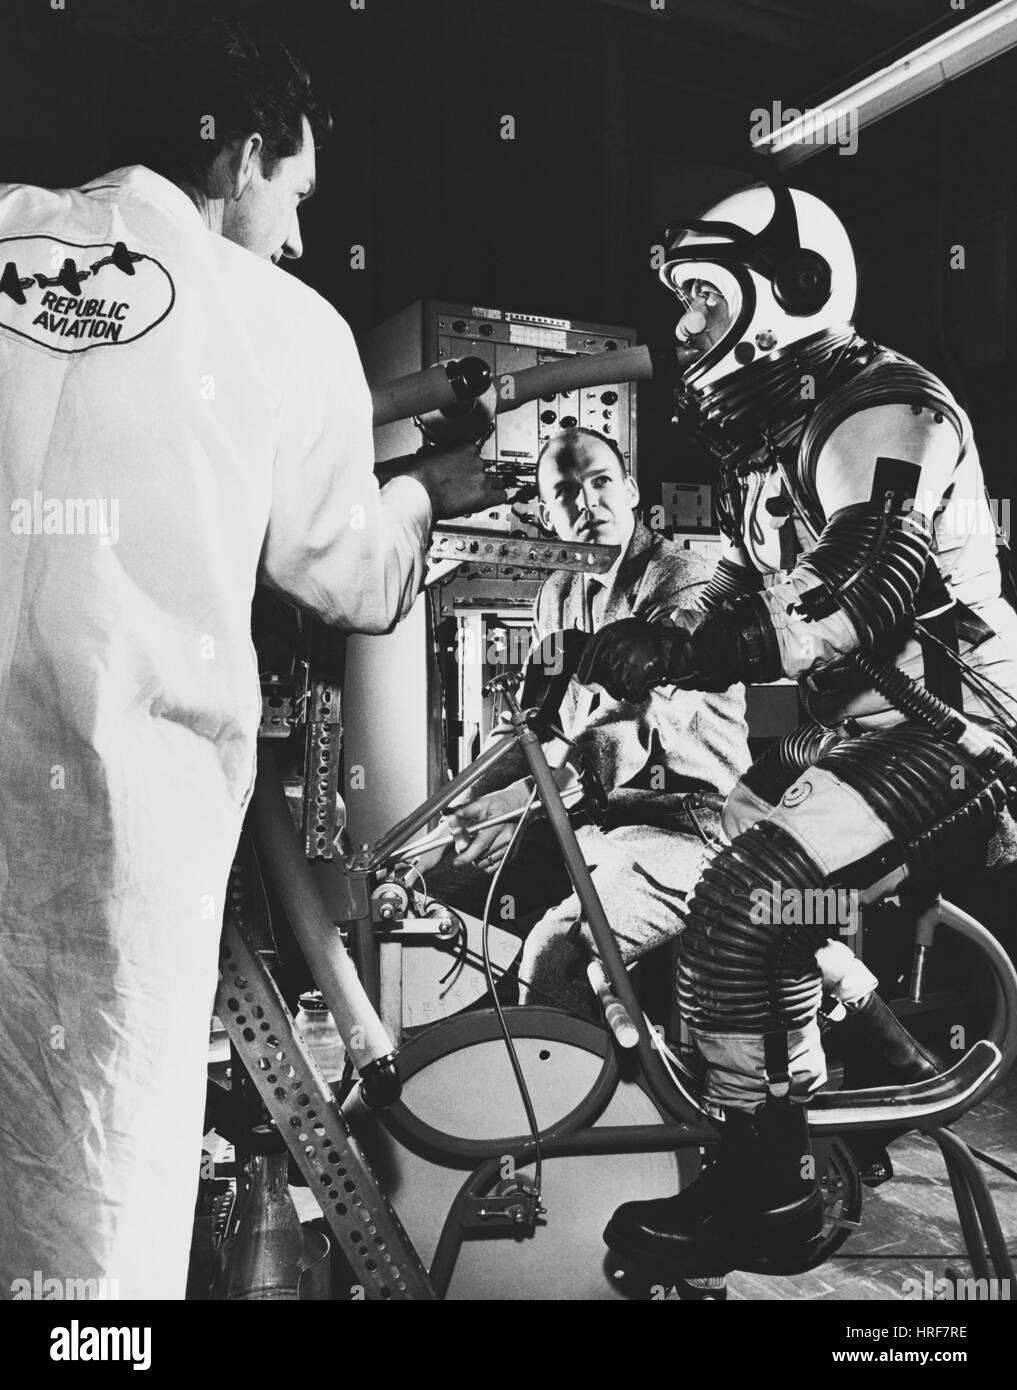 Apollo Program Research - Stock Image